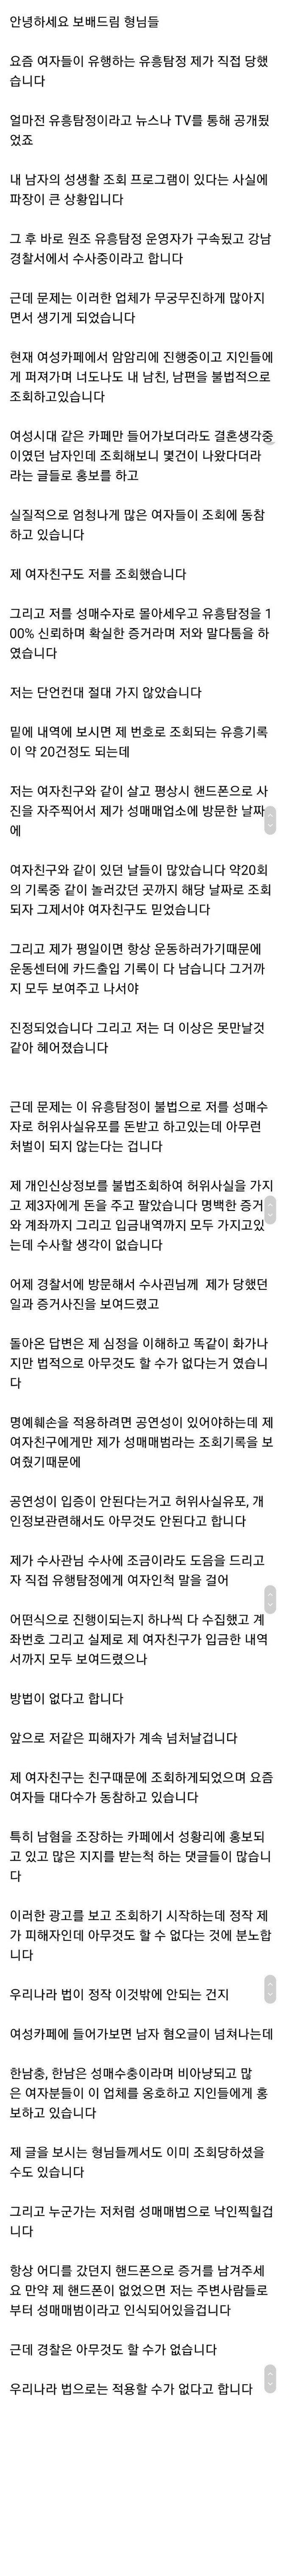 Awo5ce79a7143492.jpg 유흥탐정 어플 때문에 여친과 헤어진 보배인